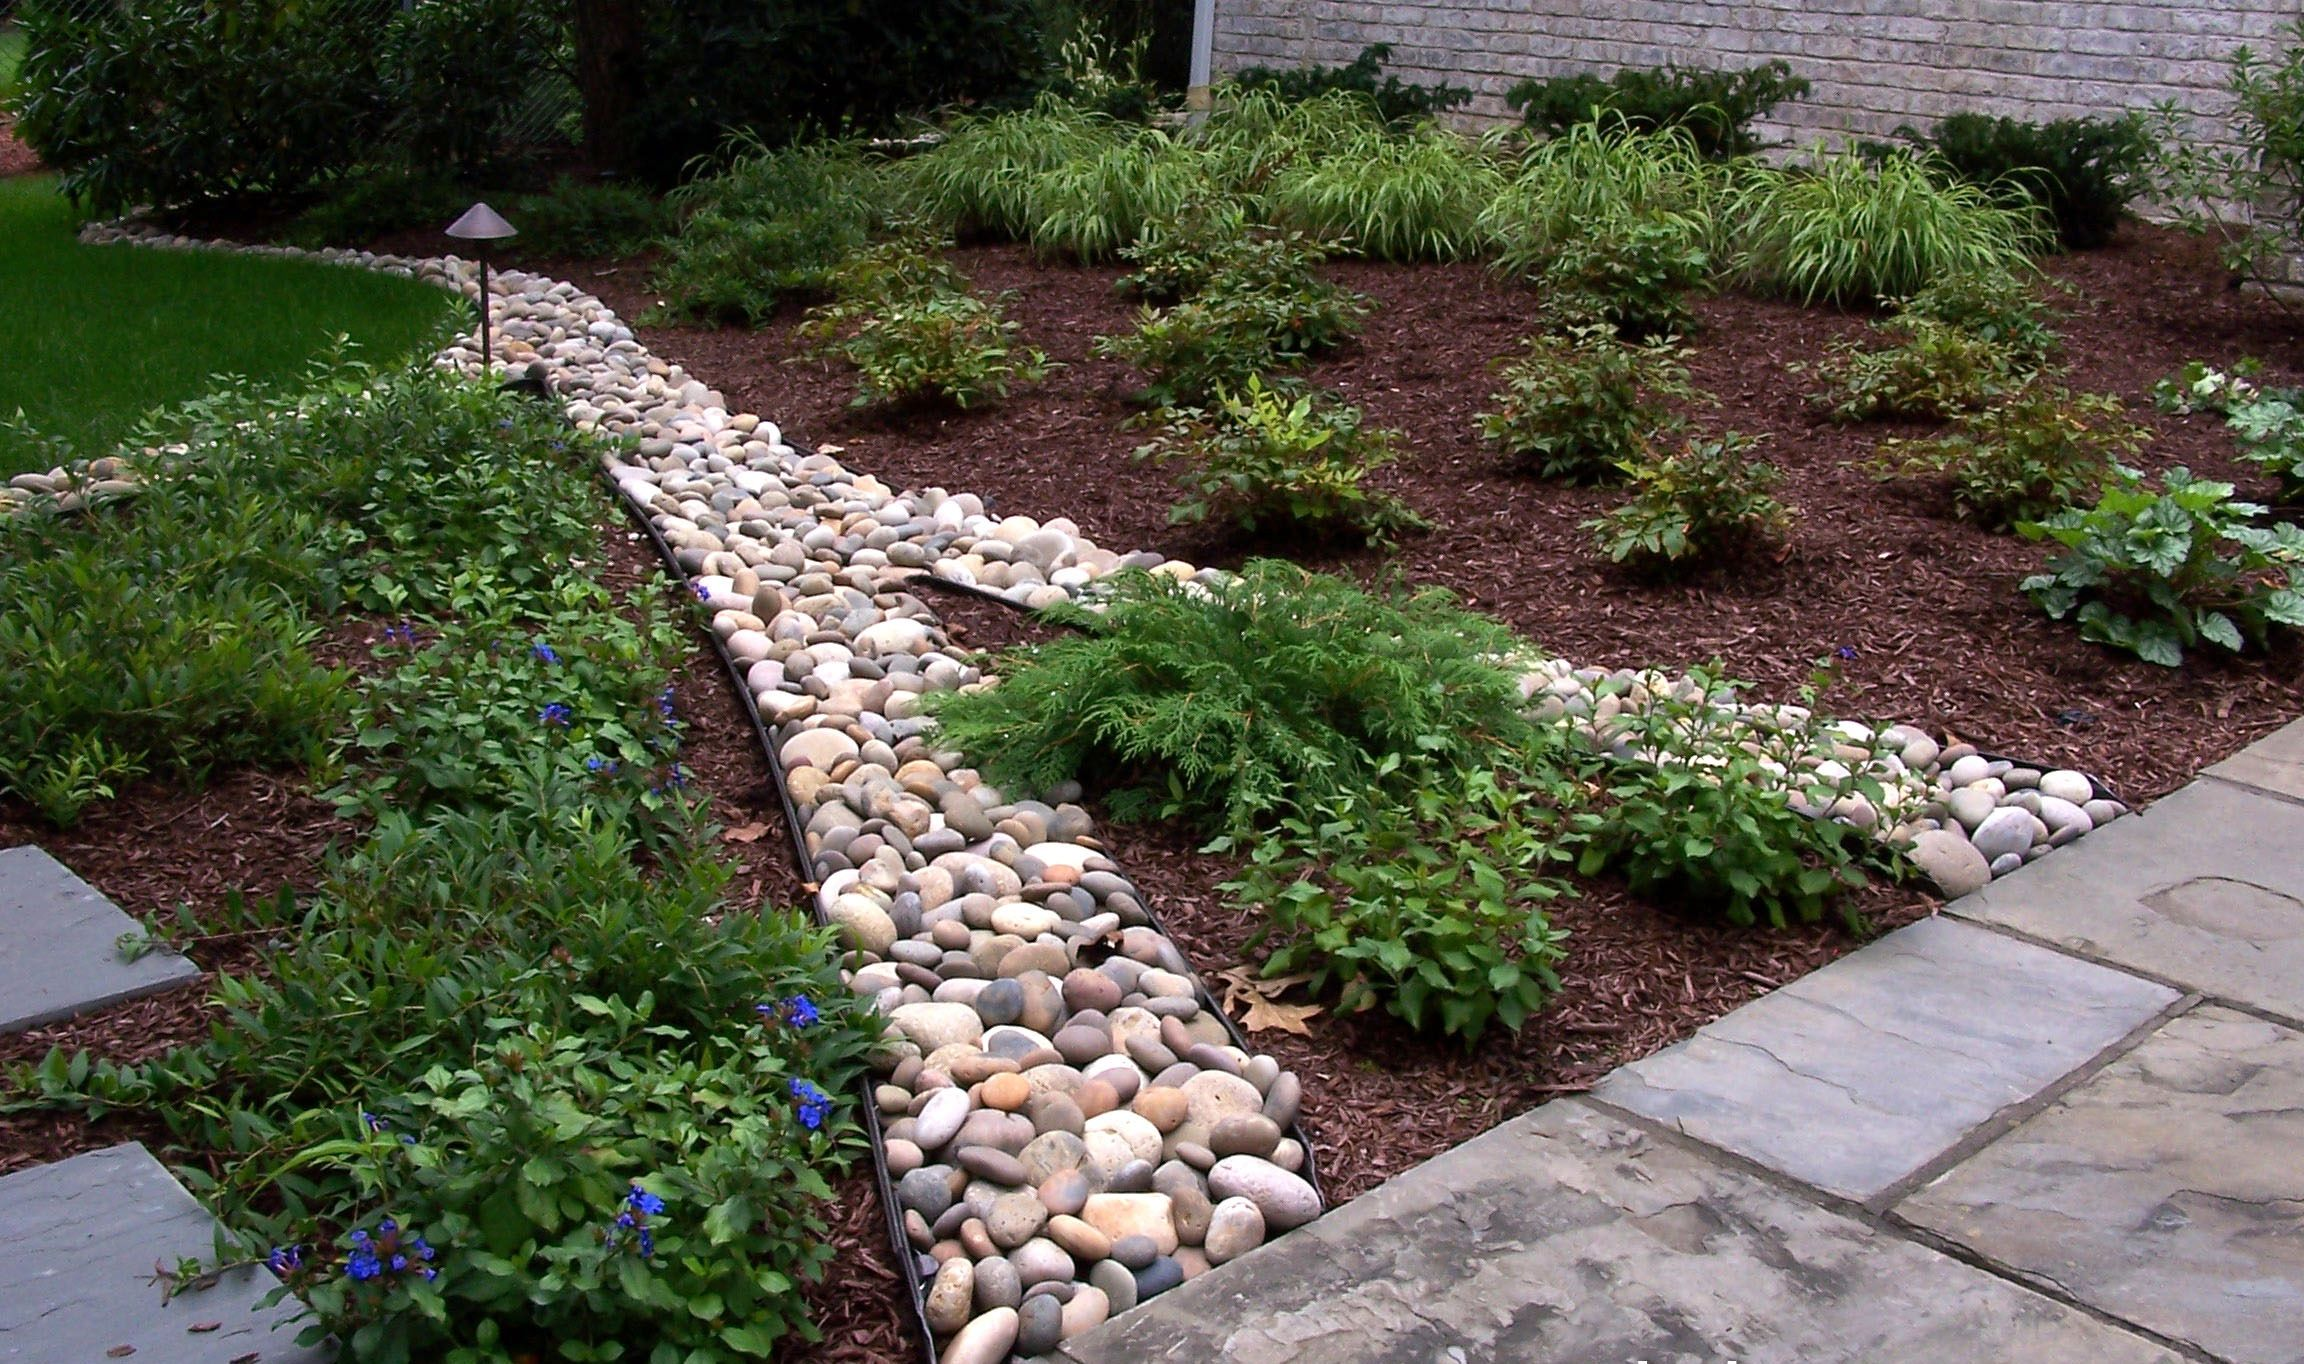 garden pebbles design - Google Search | Gardening | Pinterest | Gardens